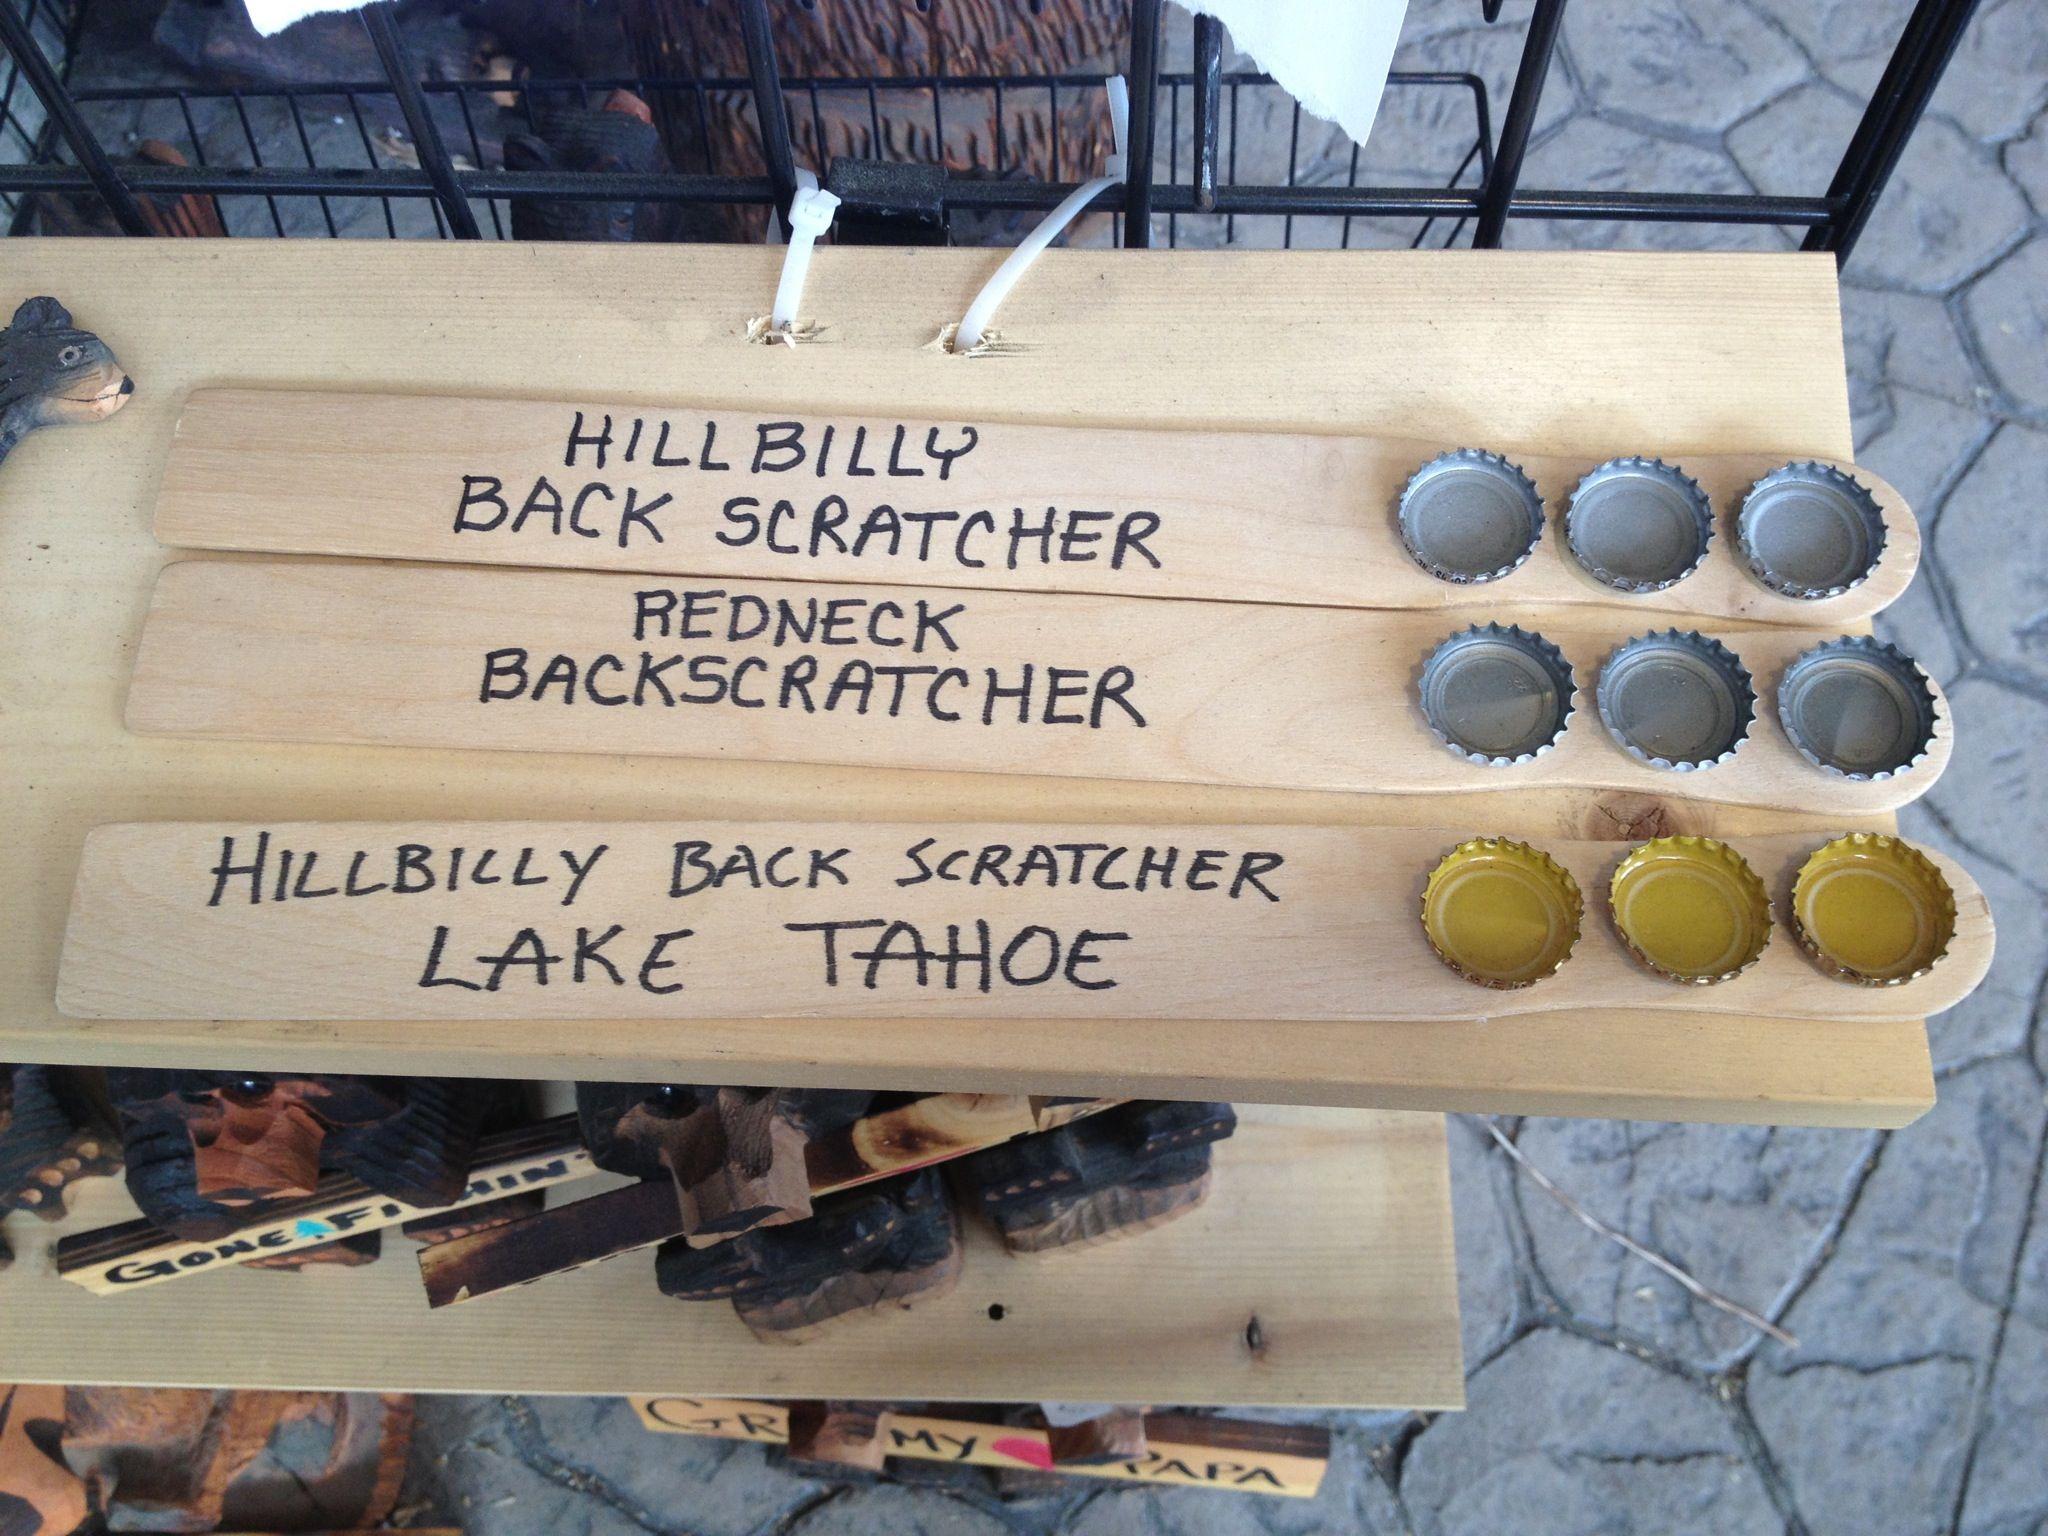 Hillbilly redneck back scratcher | Hillbilly Bash | Pinterest